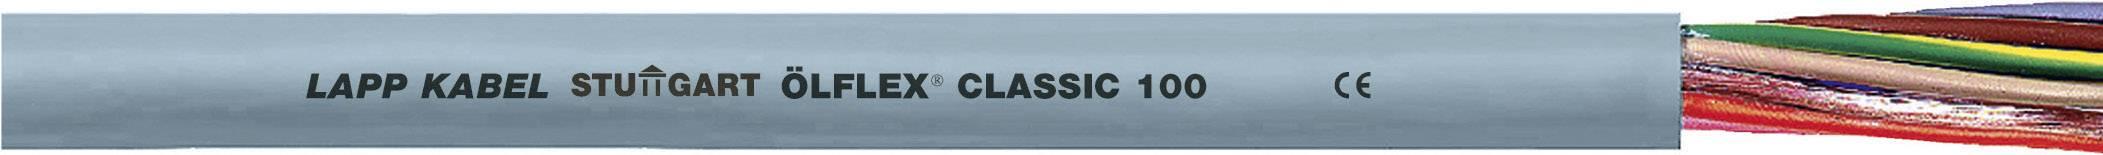 Kabel LappKabel Ölflex CLASSIC 100 4G6 (00101063), PVC, 13,8 mm, 750 V, šedá, 300 m